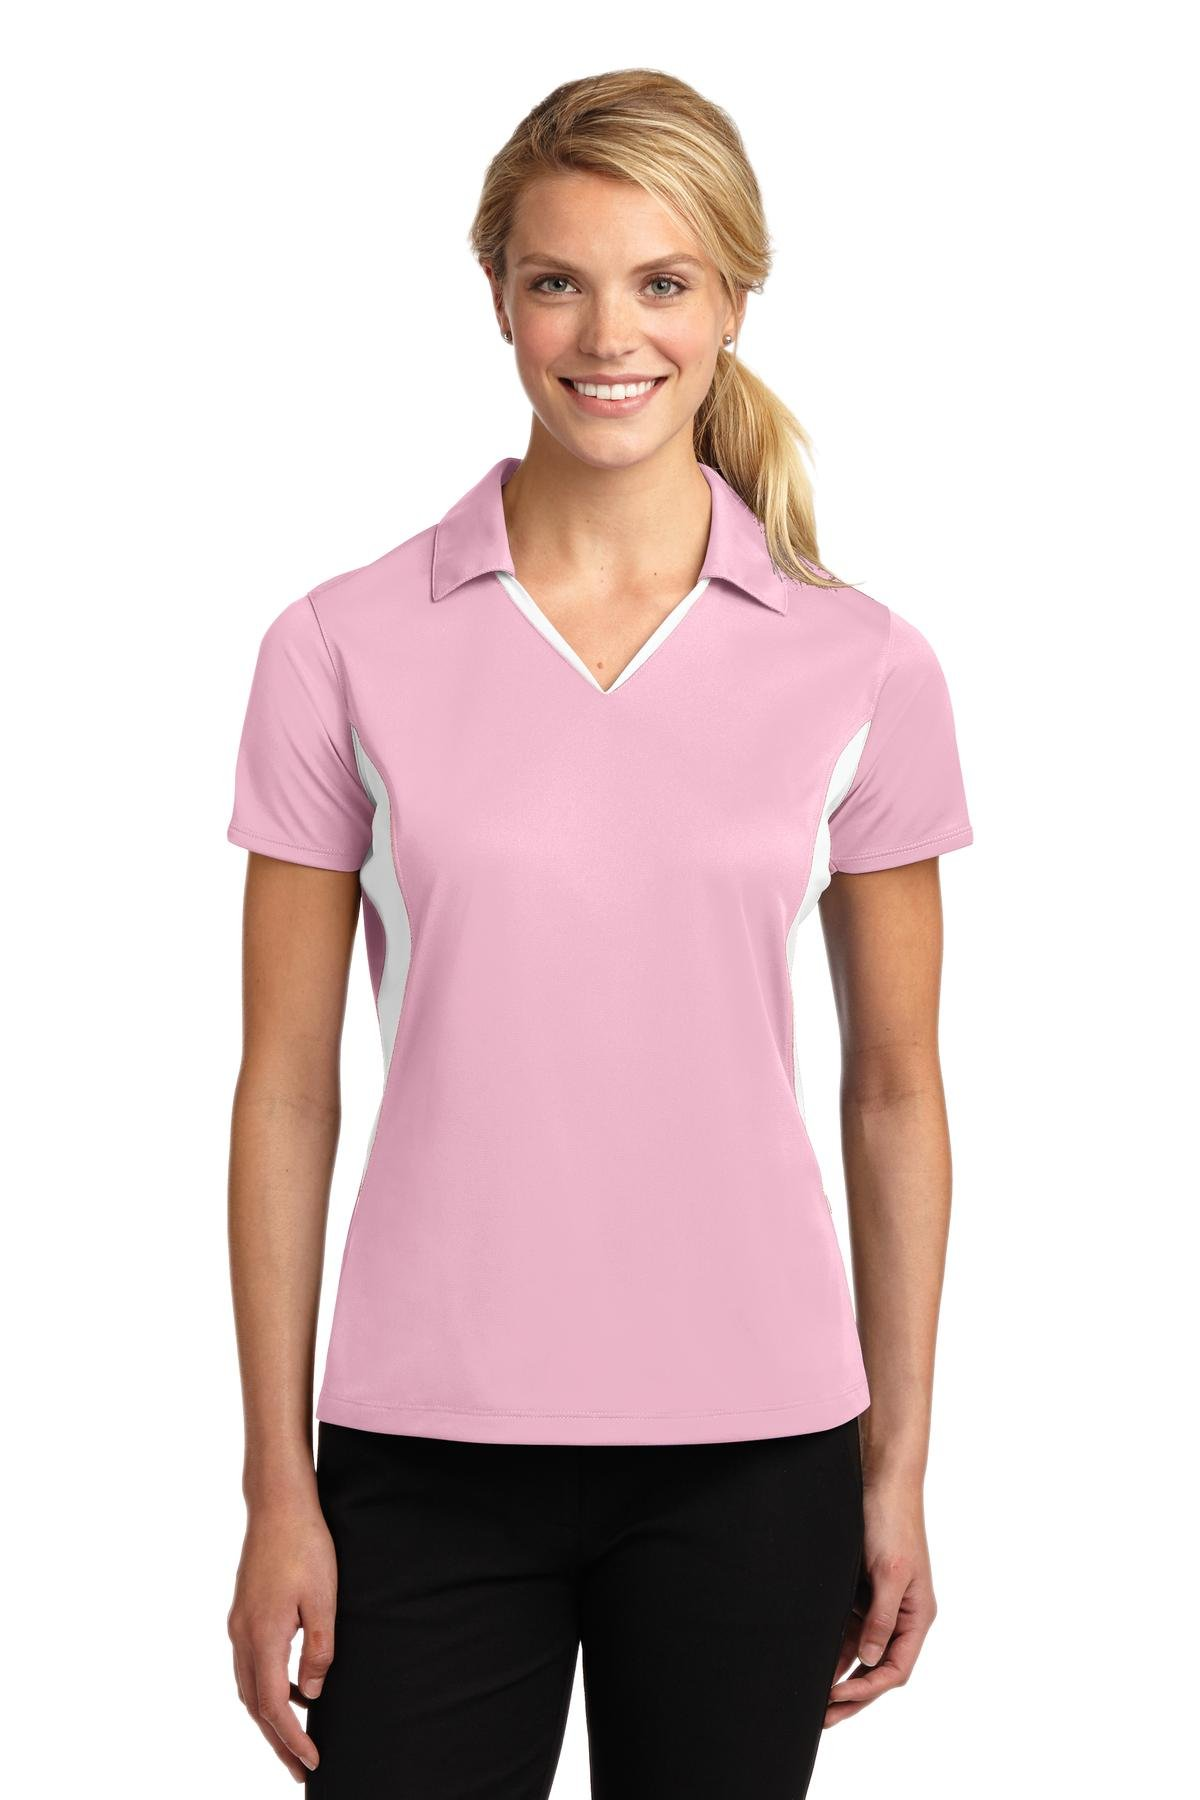 Sport-Tek Women's Side Blocked Micropique Sport Wick Polo, Light Pink/White, XXXX-Large